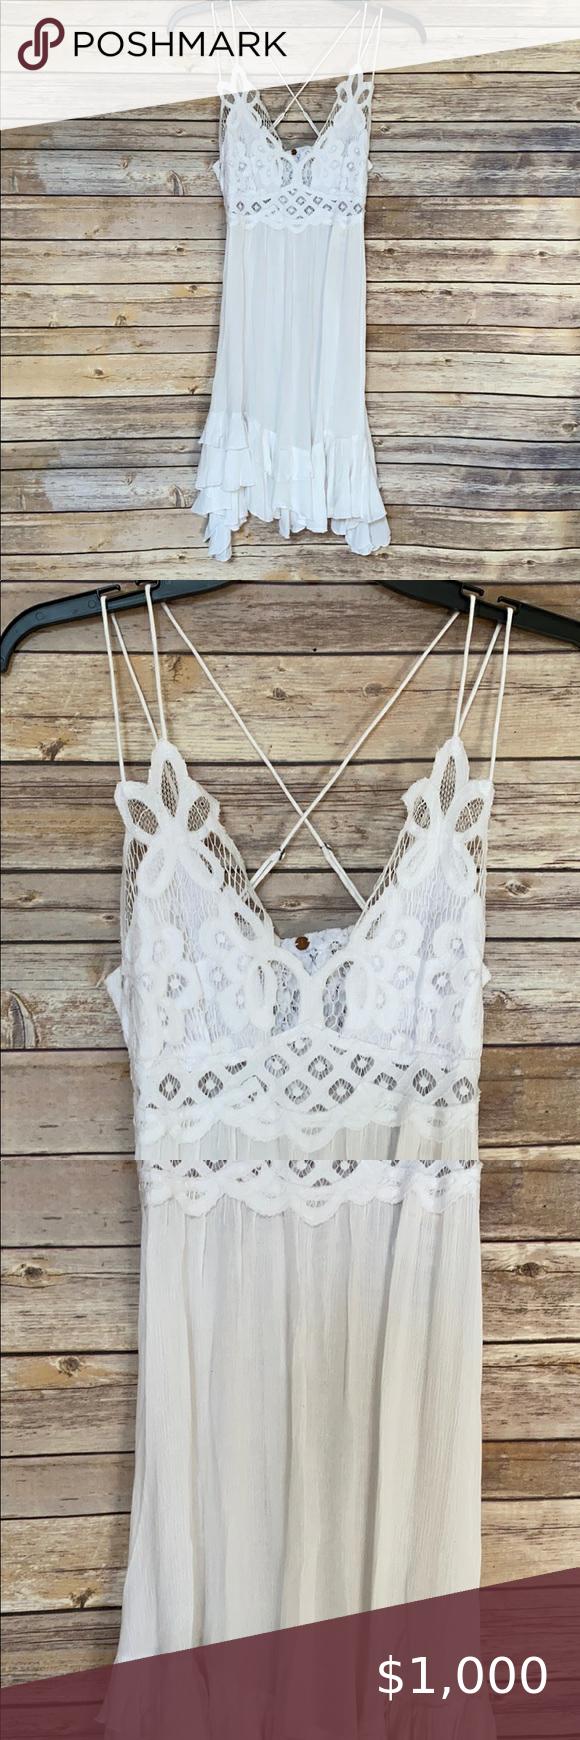 Nwt Free People Adella Lace Slip Dress White Lace Slip Dress White Slip Dress Lace Slip [ 1740 x 580 Pixel ]